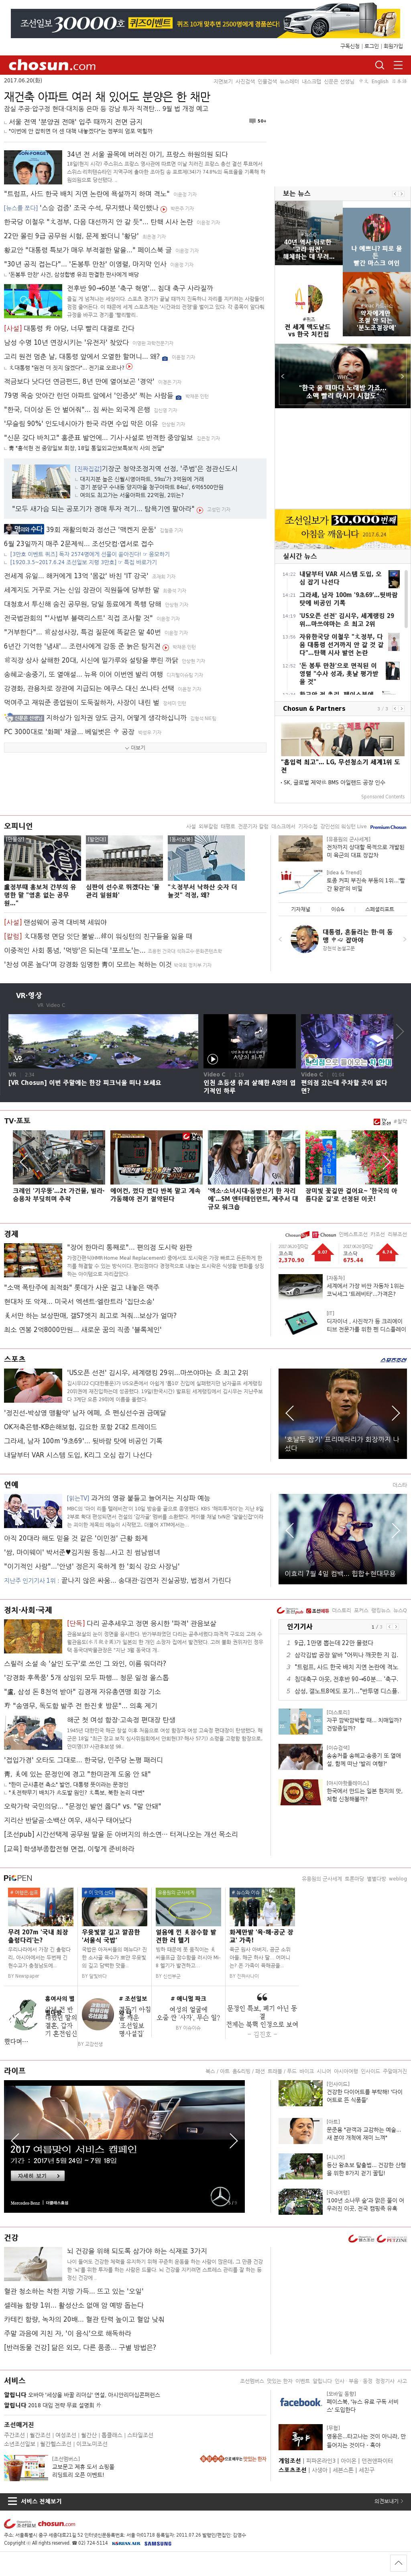 chosun.com at Monday June 19, 2017, 4:03 p.m. UTC